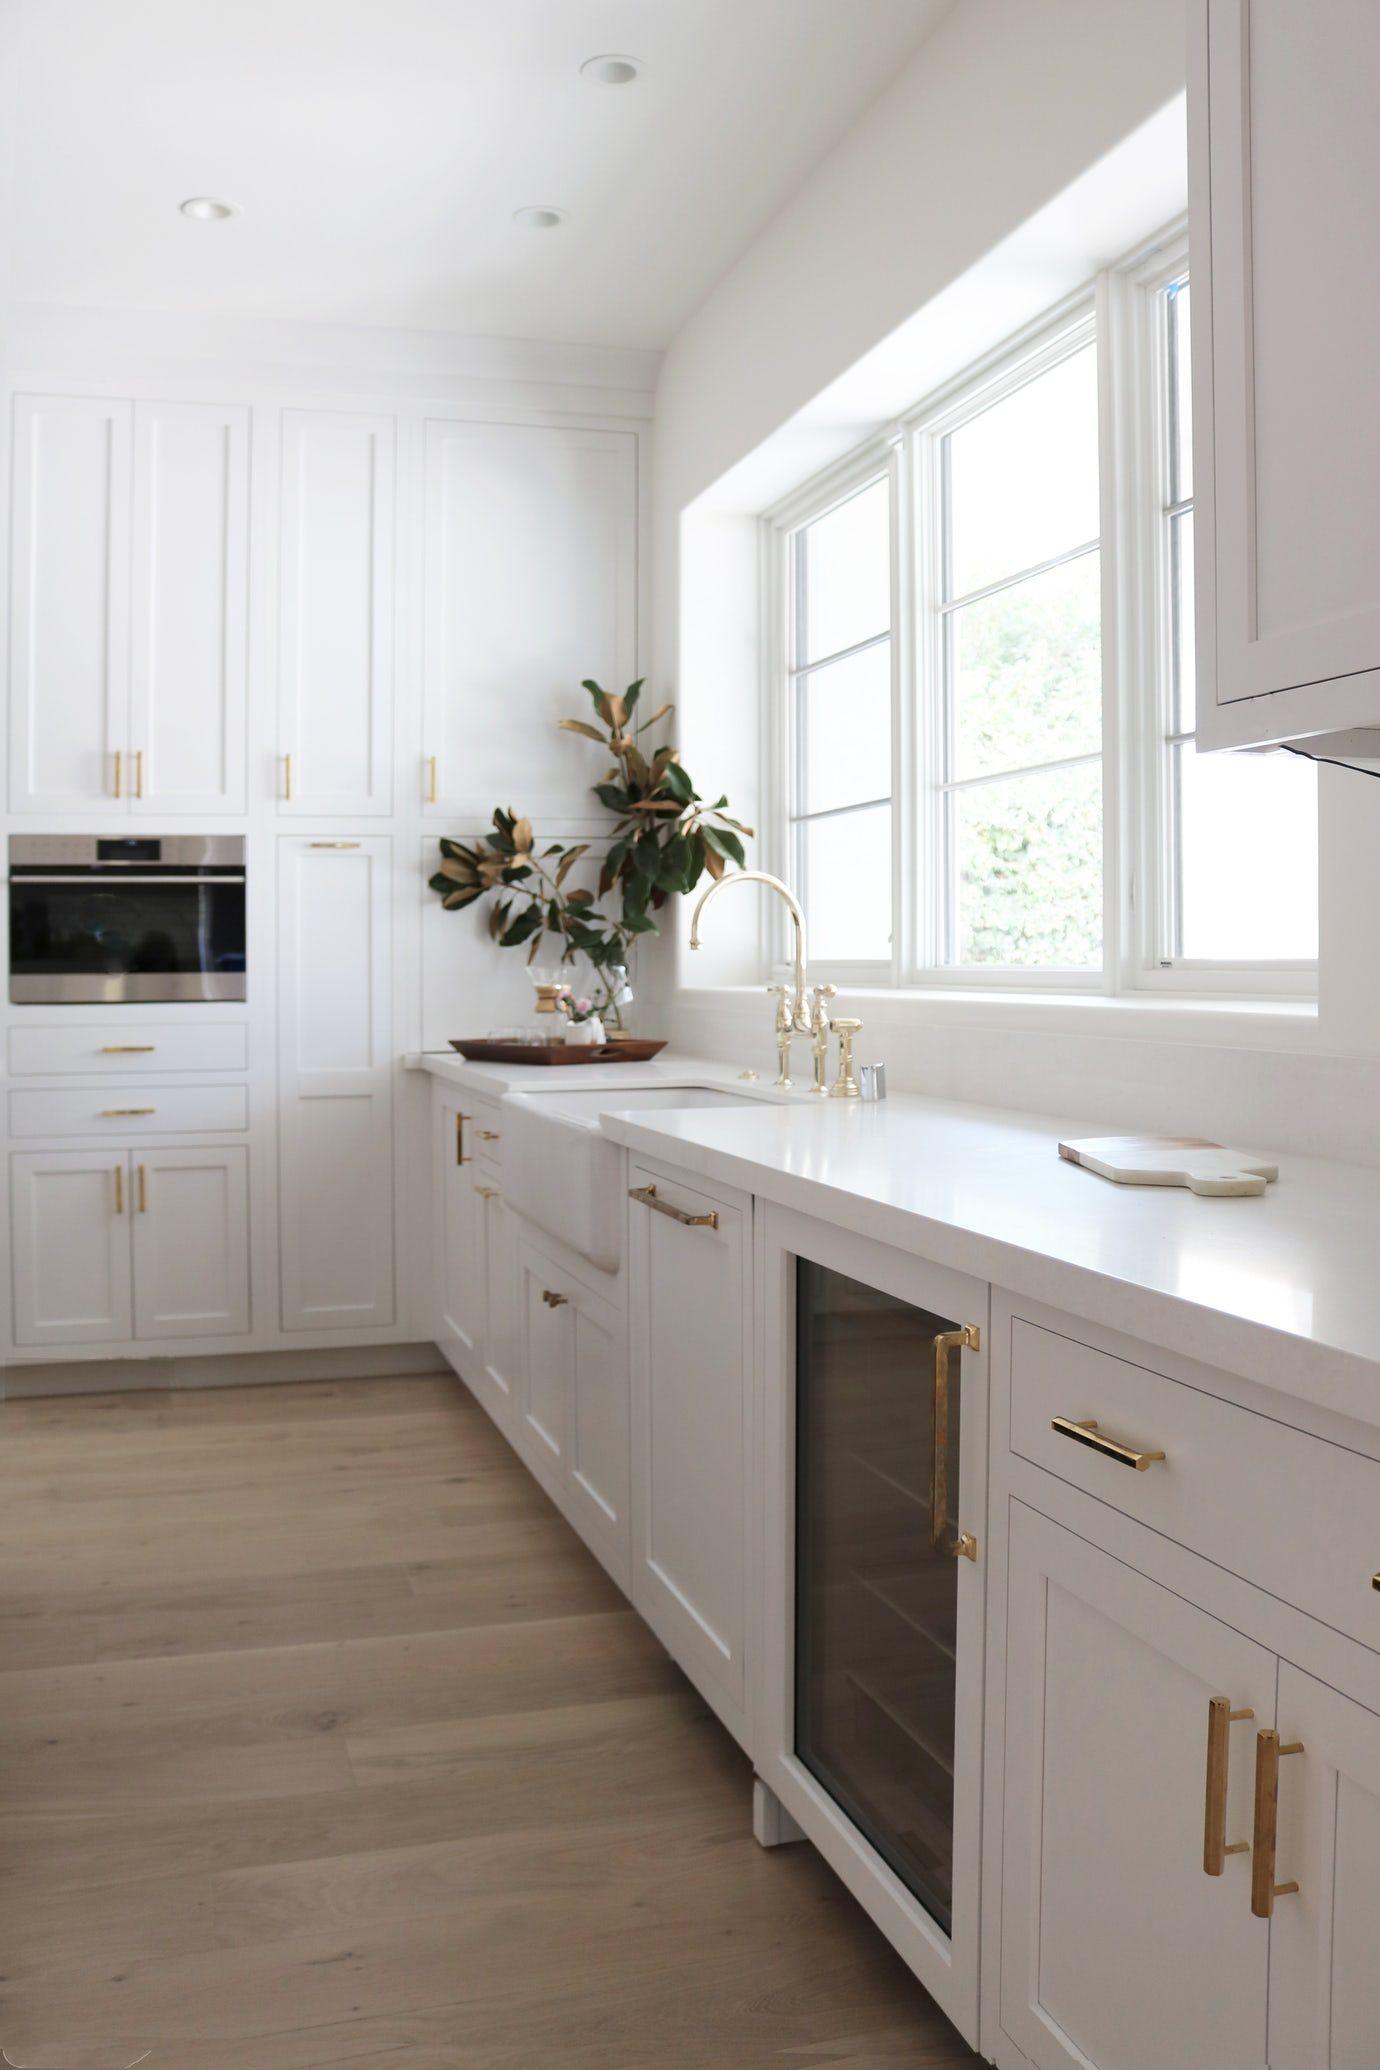 Fremont Place Kitchen By Jordan Shields Design Llc Lookbook